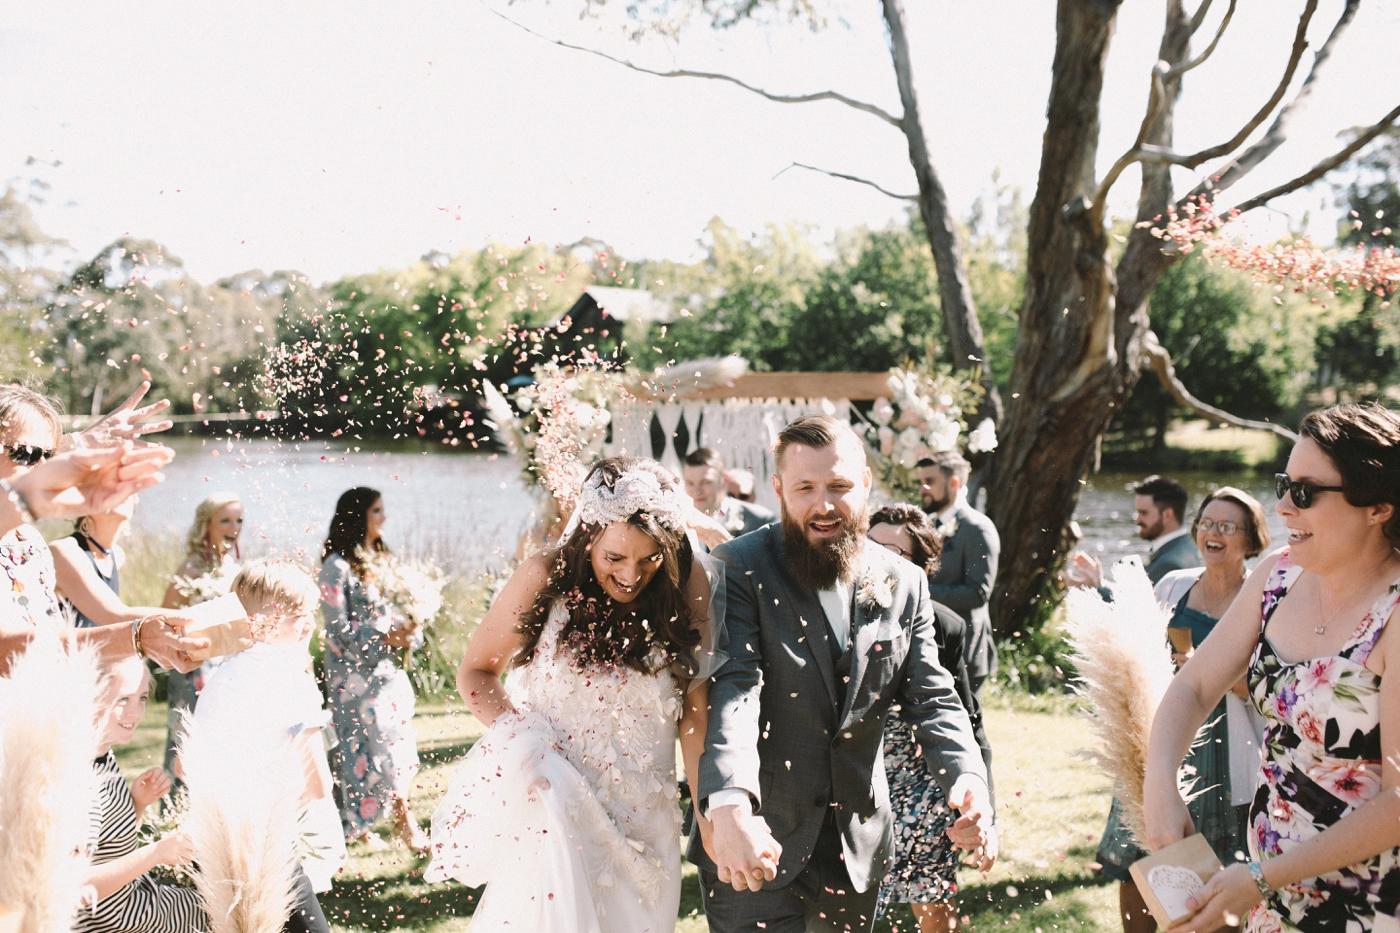 Maddy & Wes - K1 by Geoff Hardy Wedding - Adelaide Wedding Photographer - Natural wedding photography in Adelaide - Katherine Schultz_0033.jpg